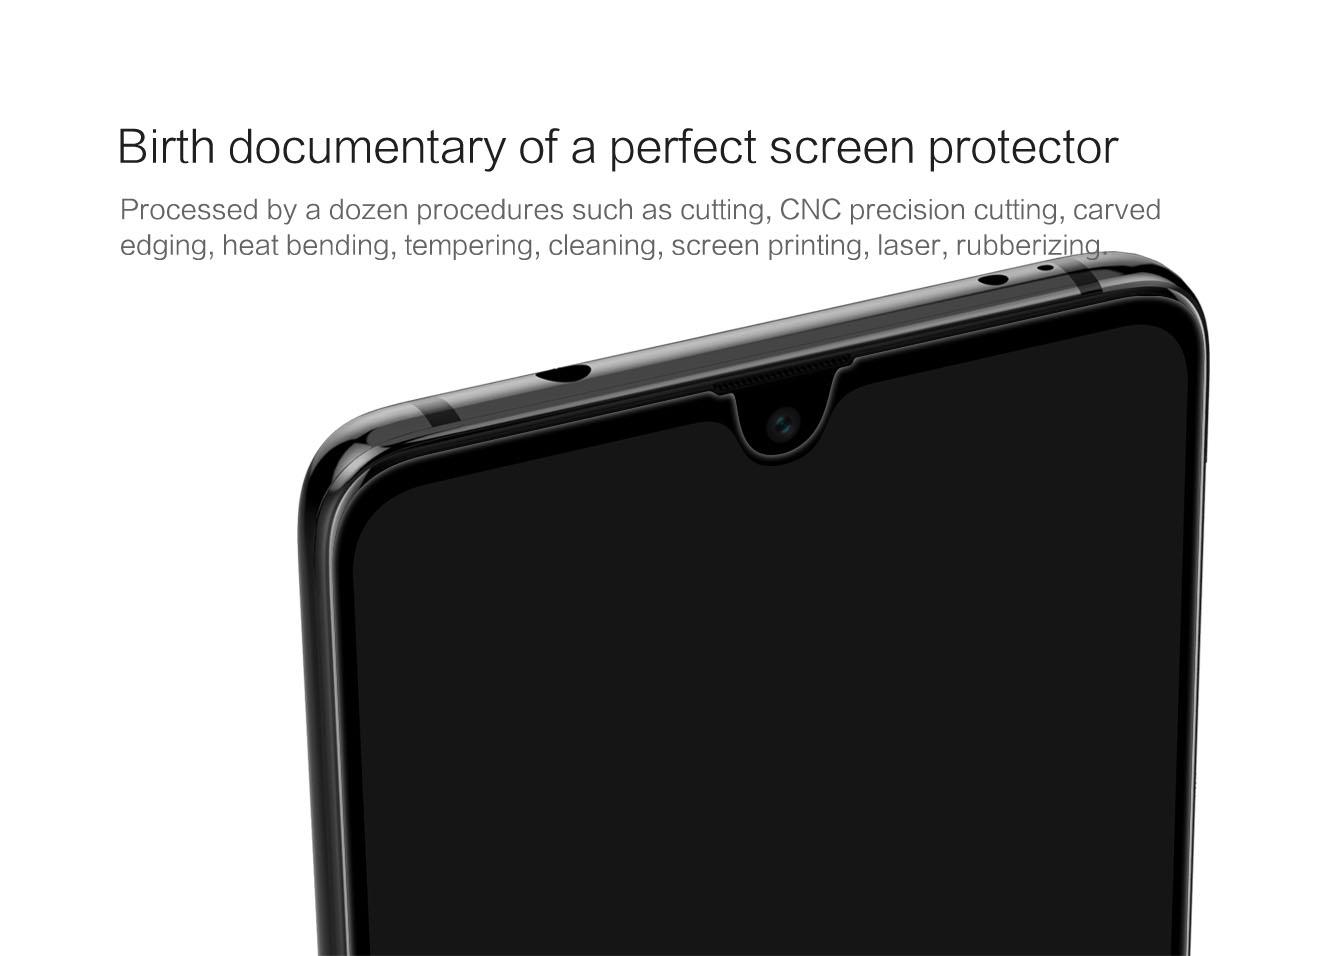 HUAWEI MATE 20 screen protector